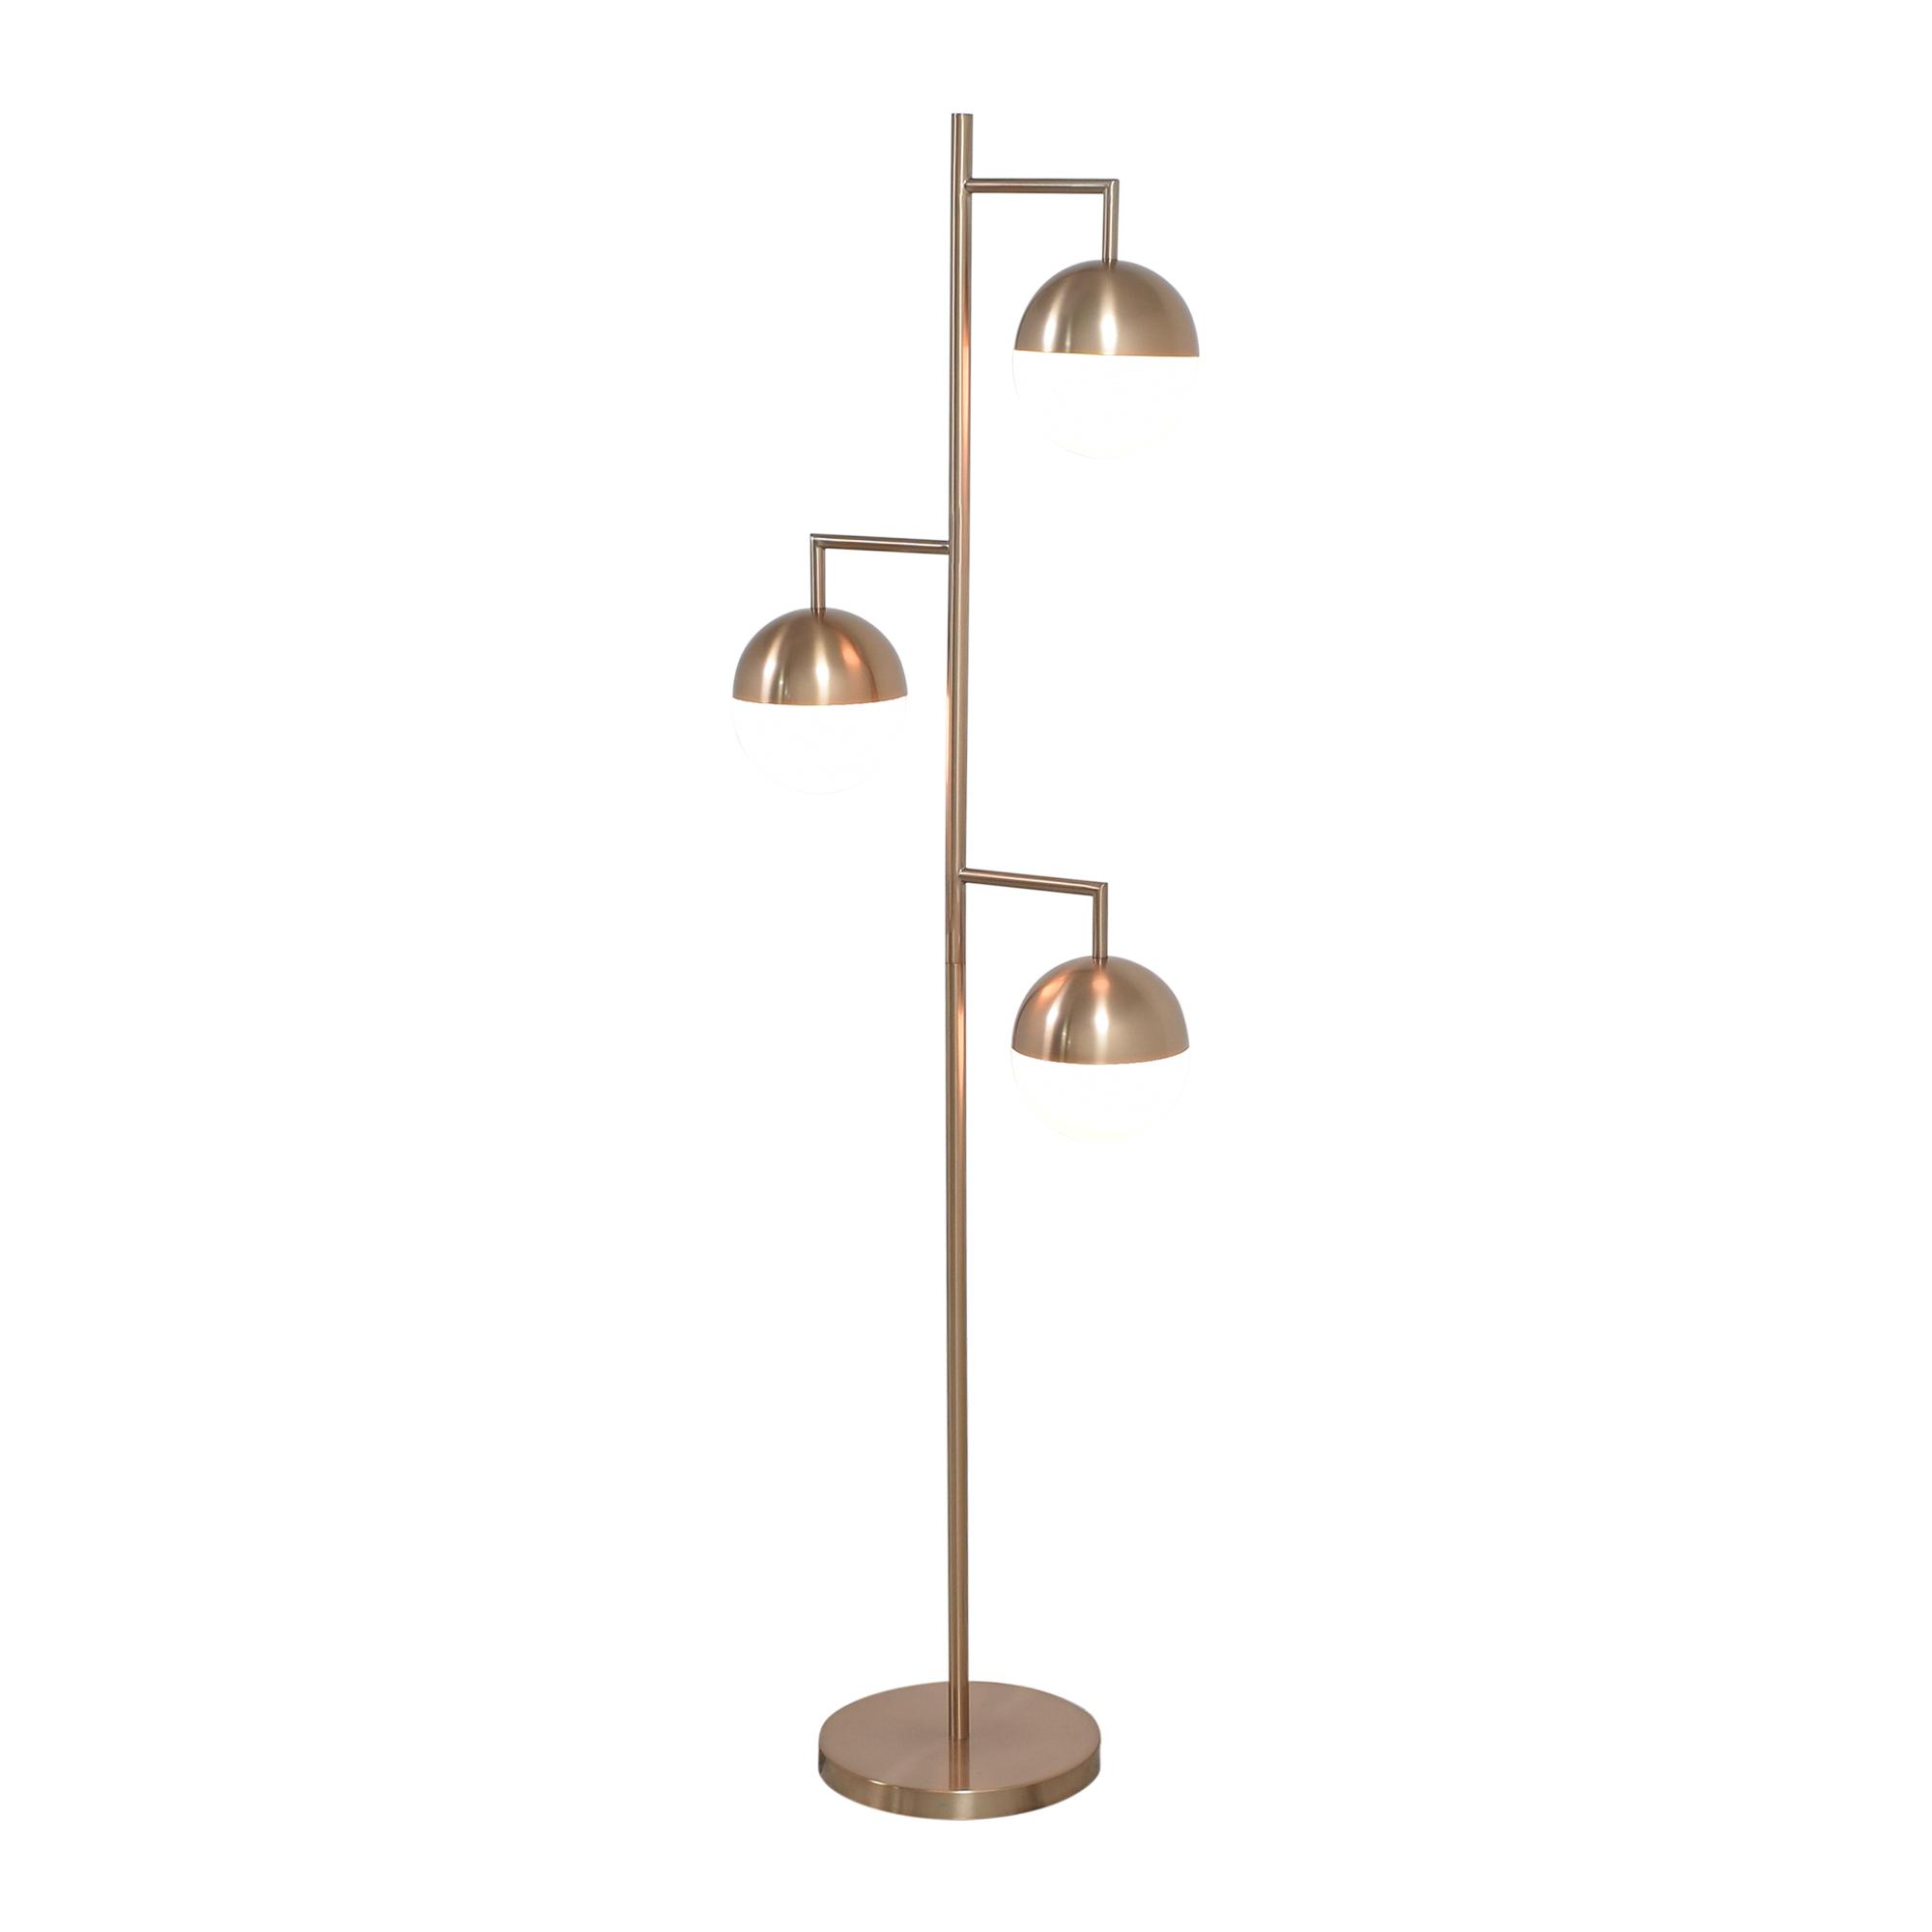 CB2 Orbs Floor Lamp sale